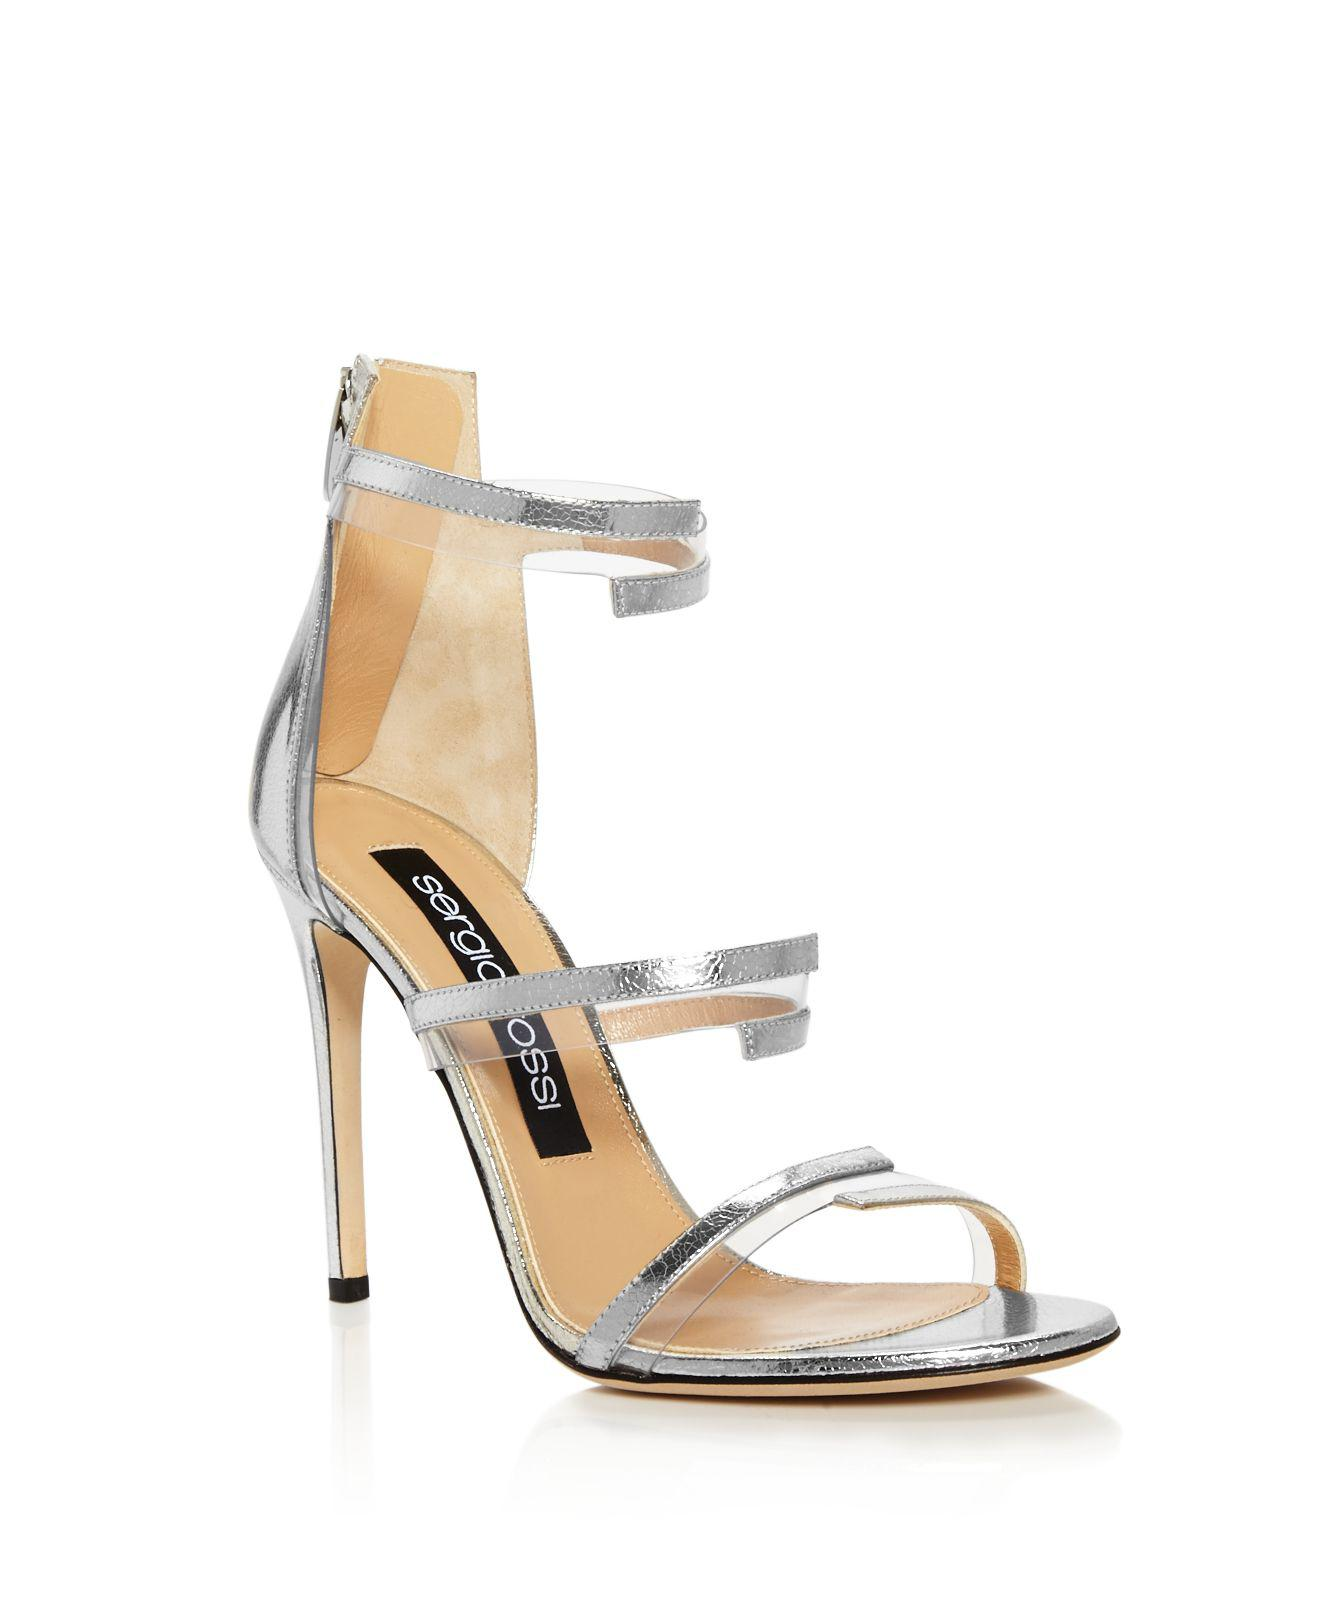 Sergio Rossi Karen Triple Strap Illusion High-Heel Sandals 6crwfW